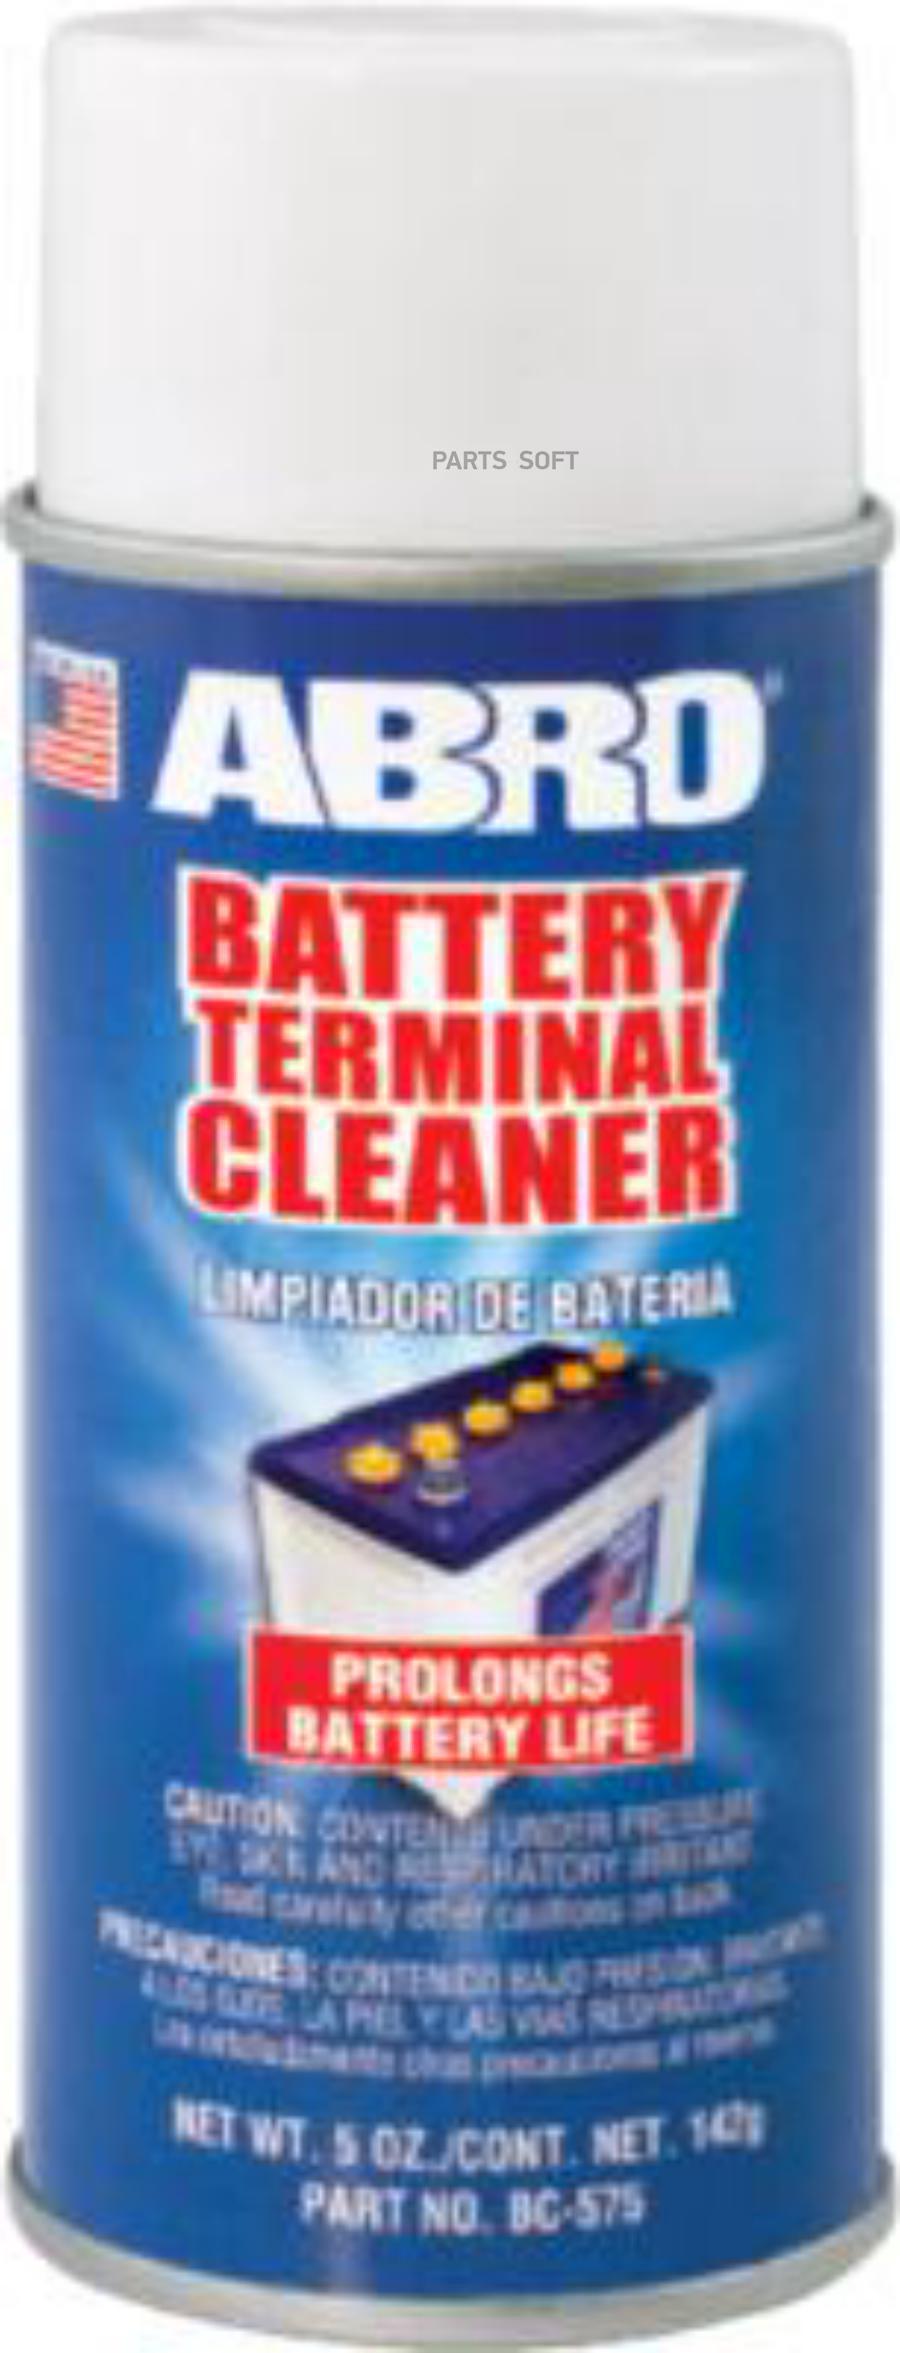 Очиститель клемм аккумулятора (142 гр.)